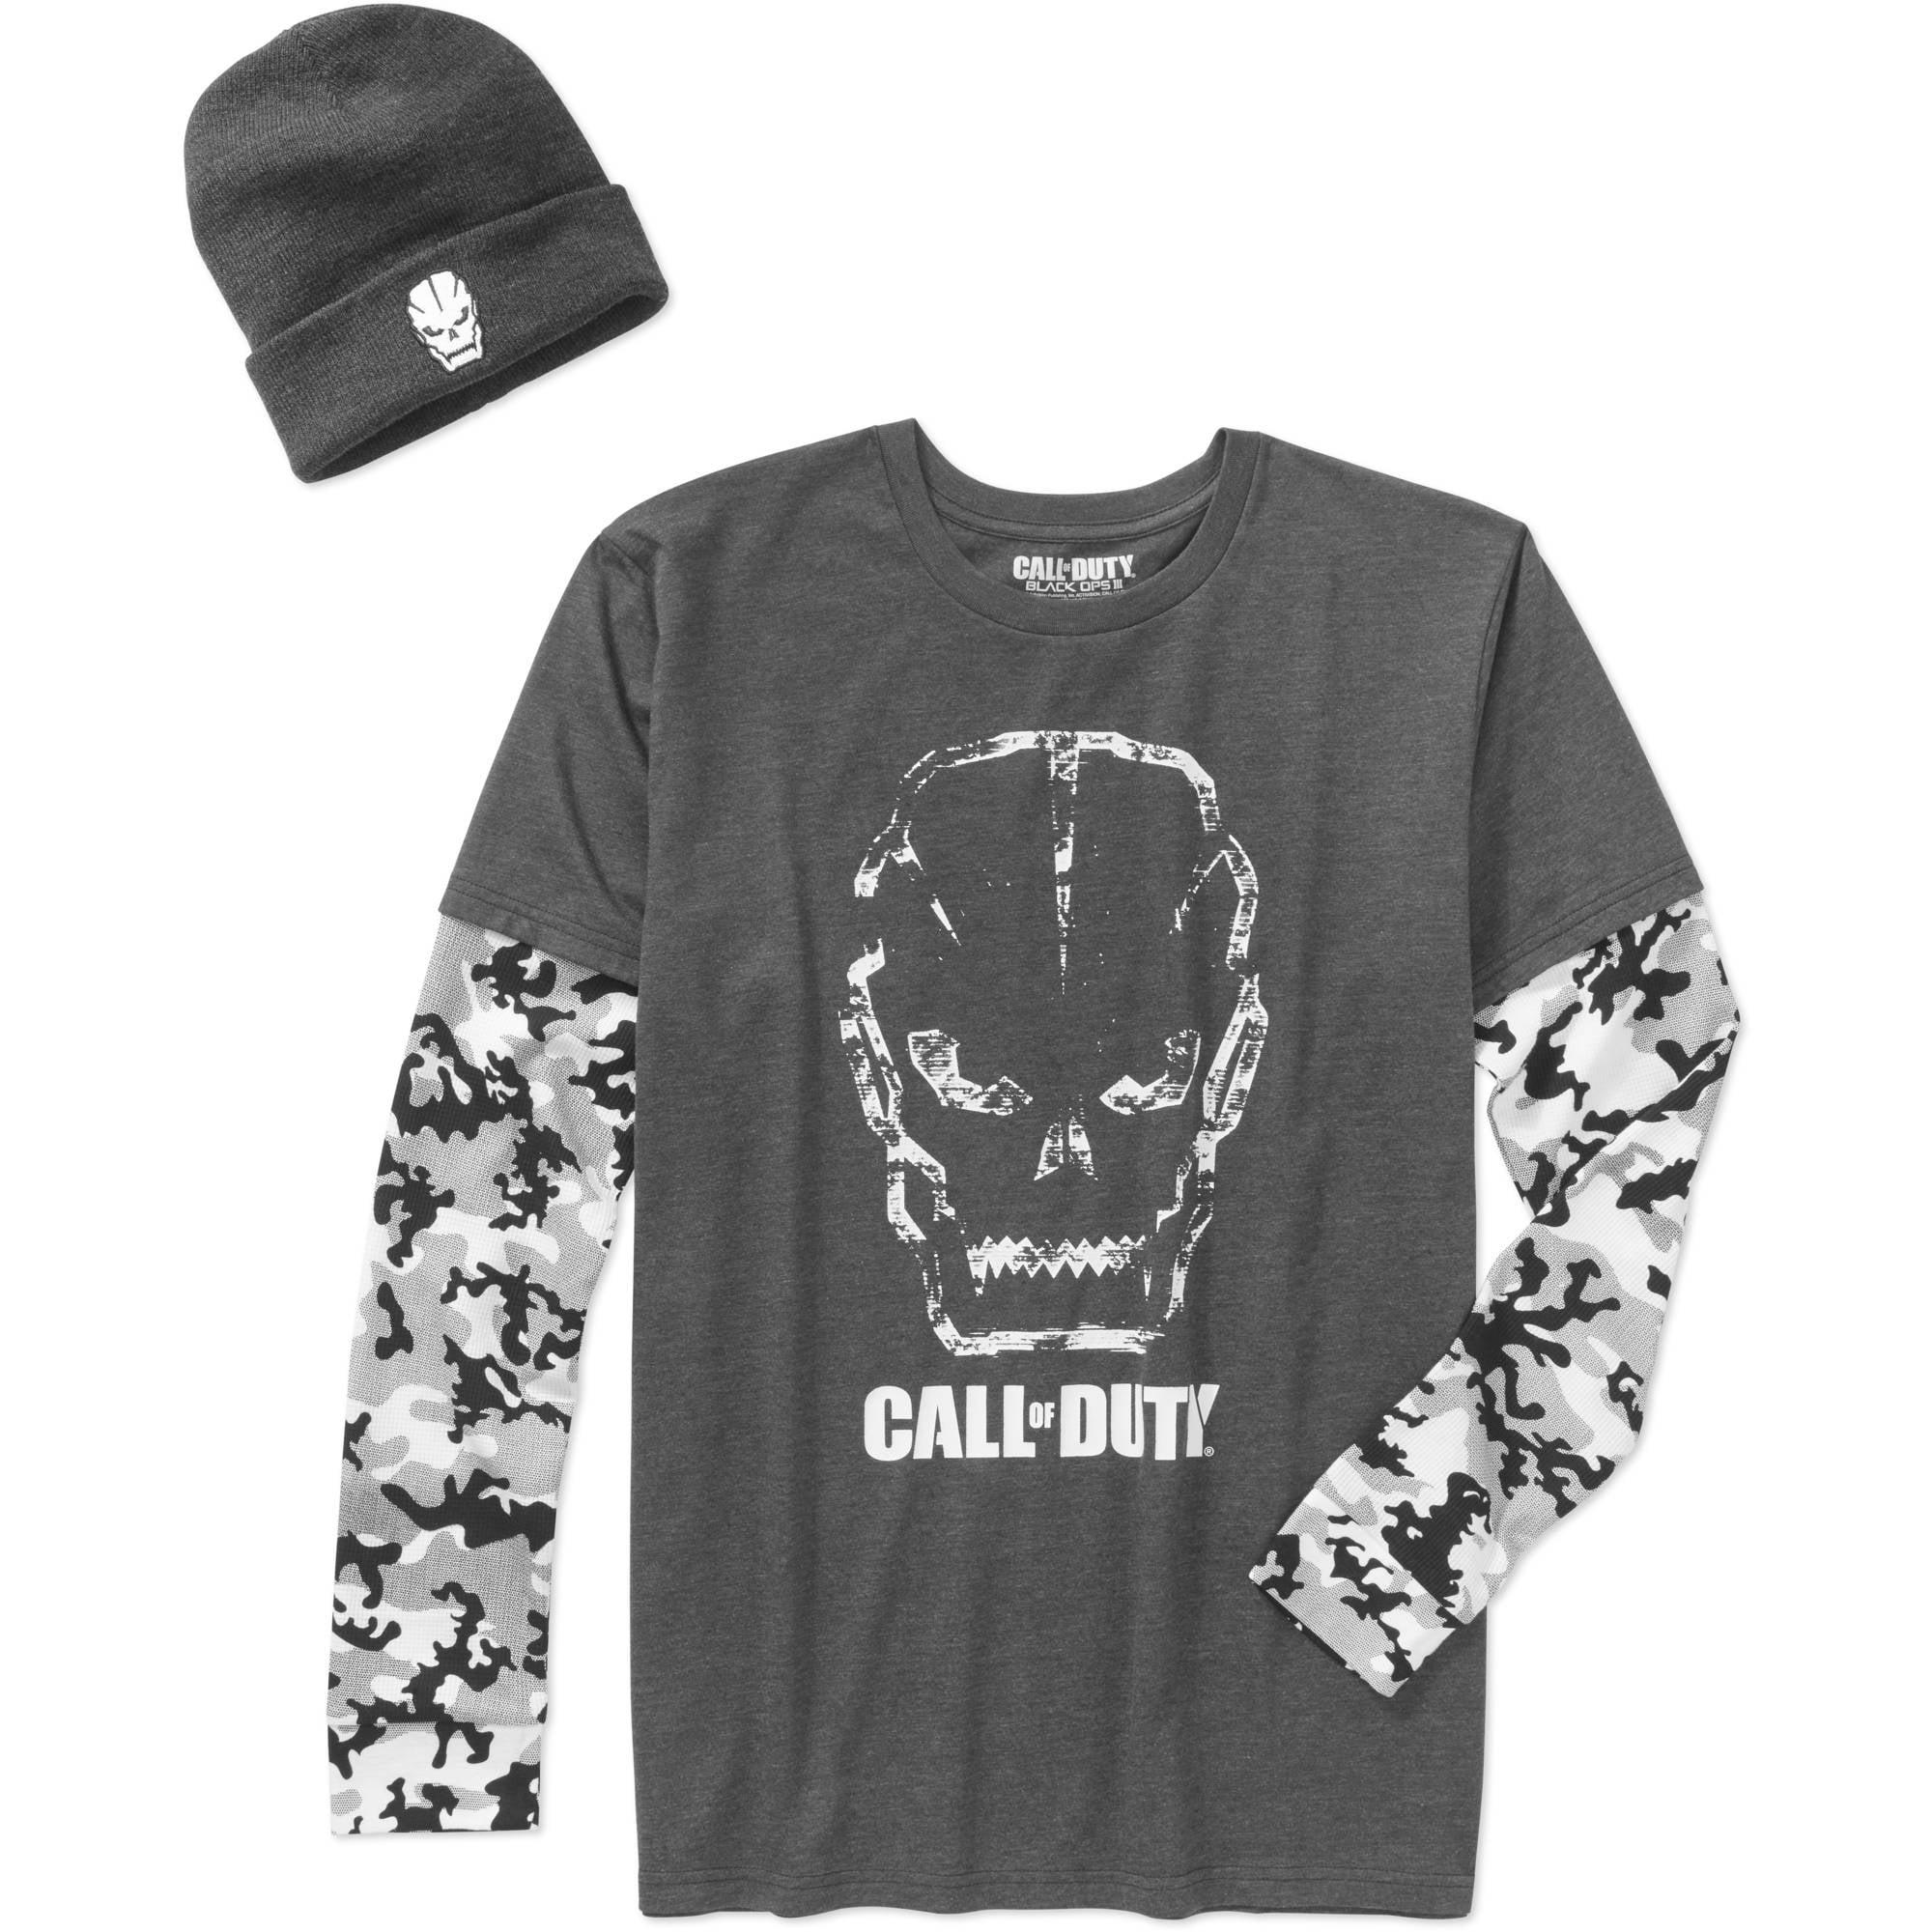 Call of Duty Men's Shirt & Beanie Combo